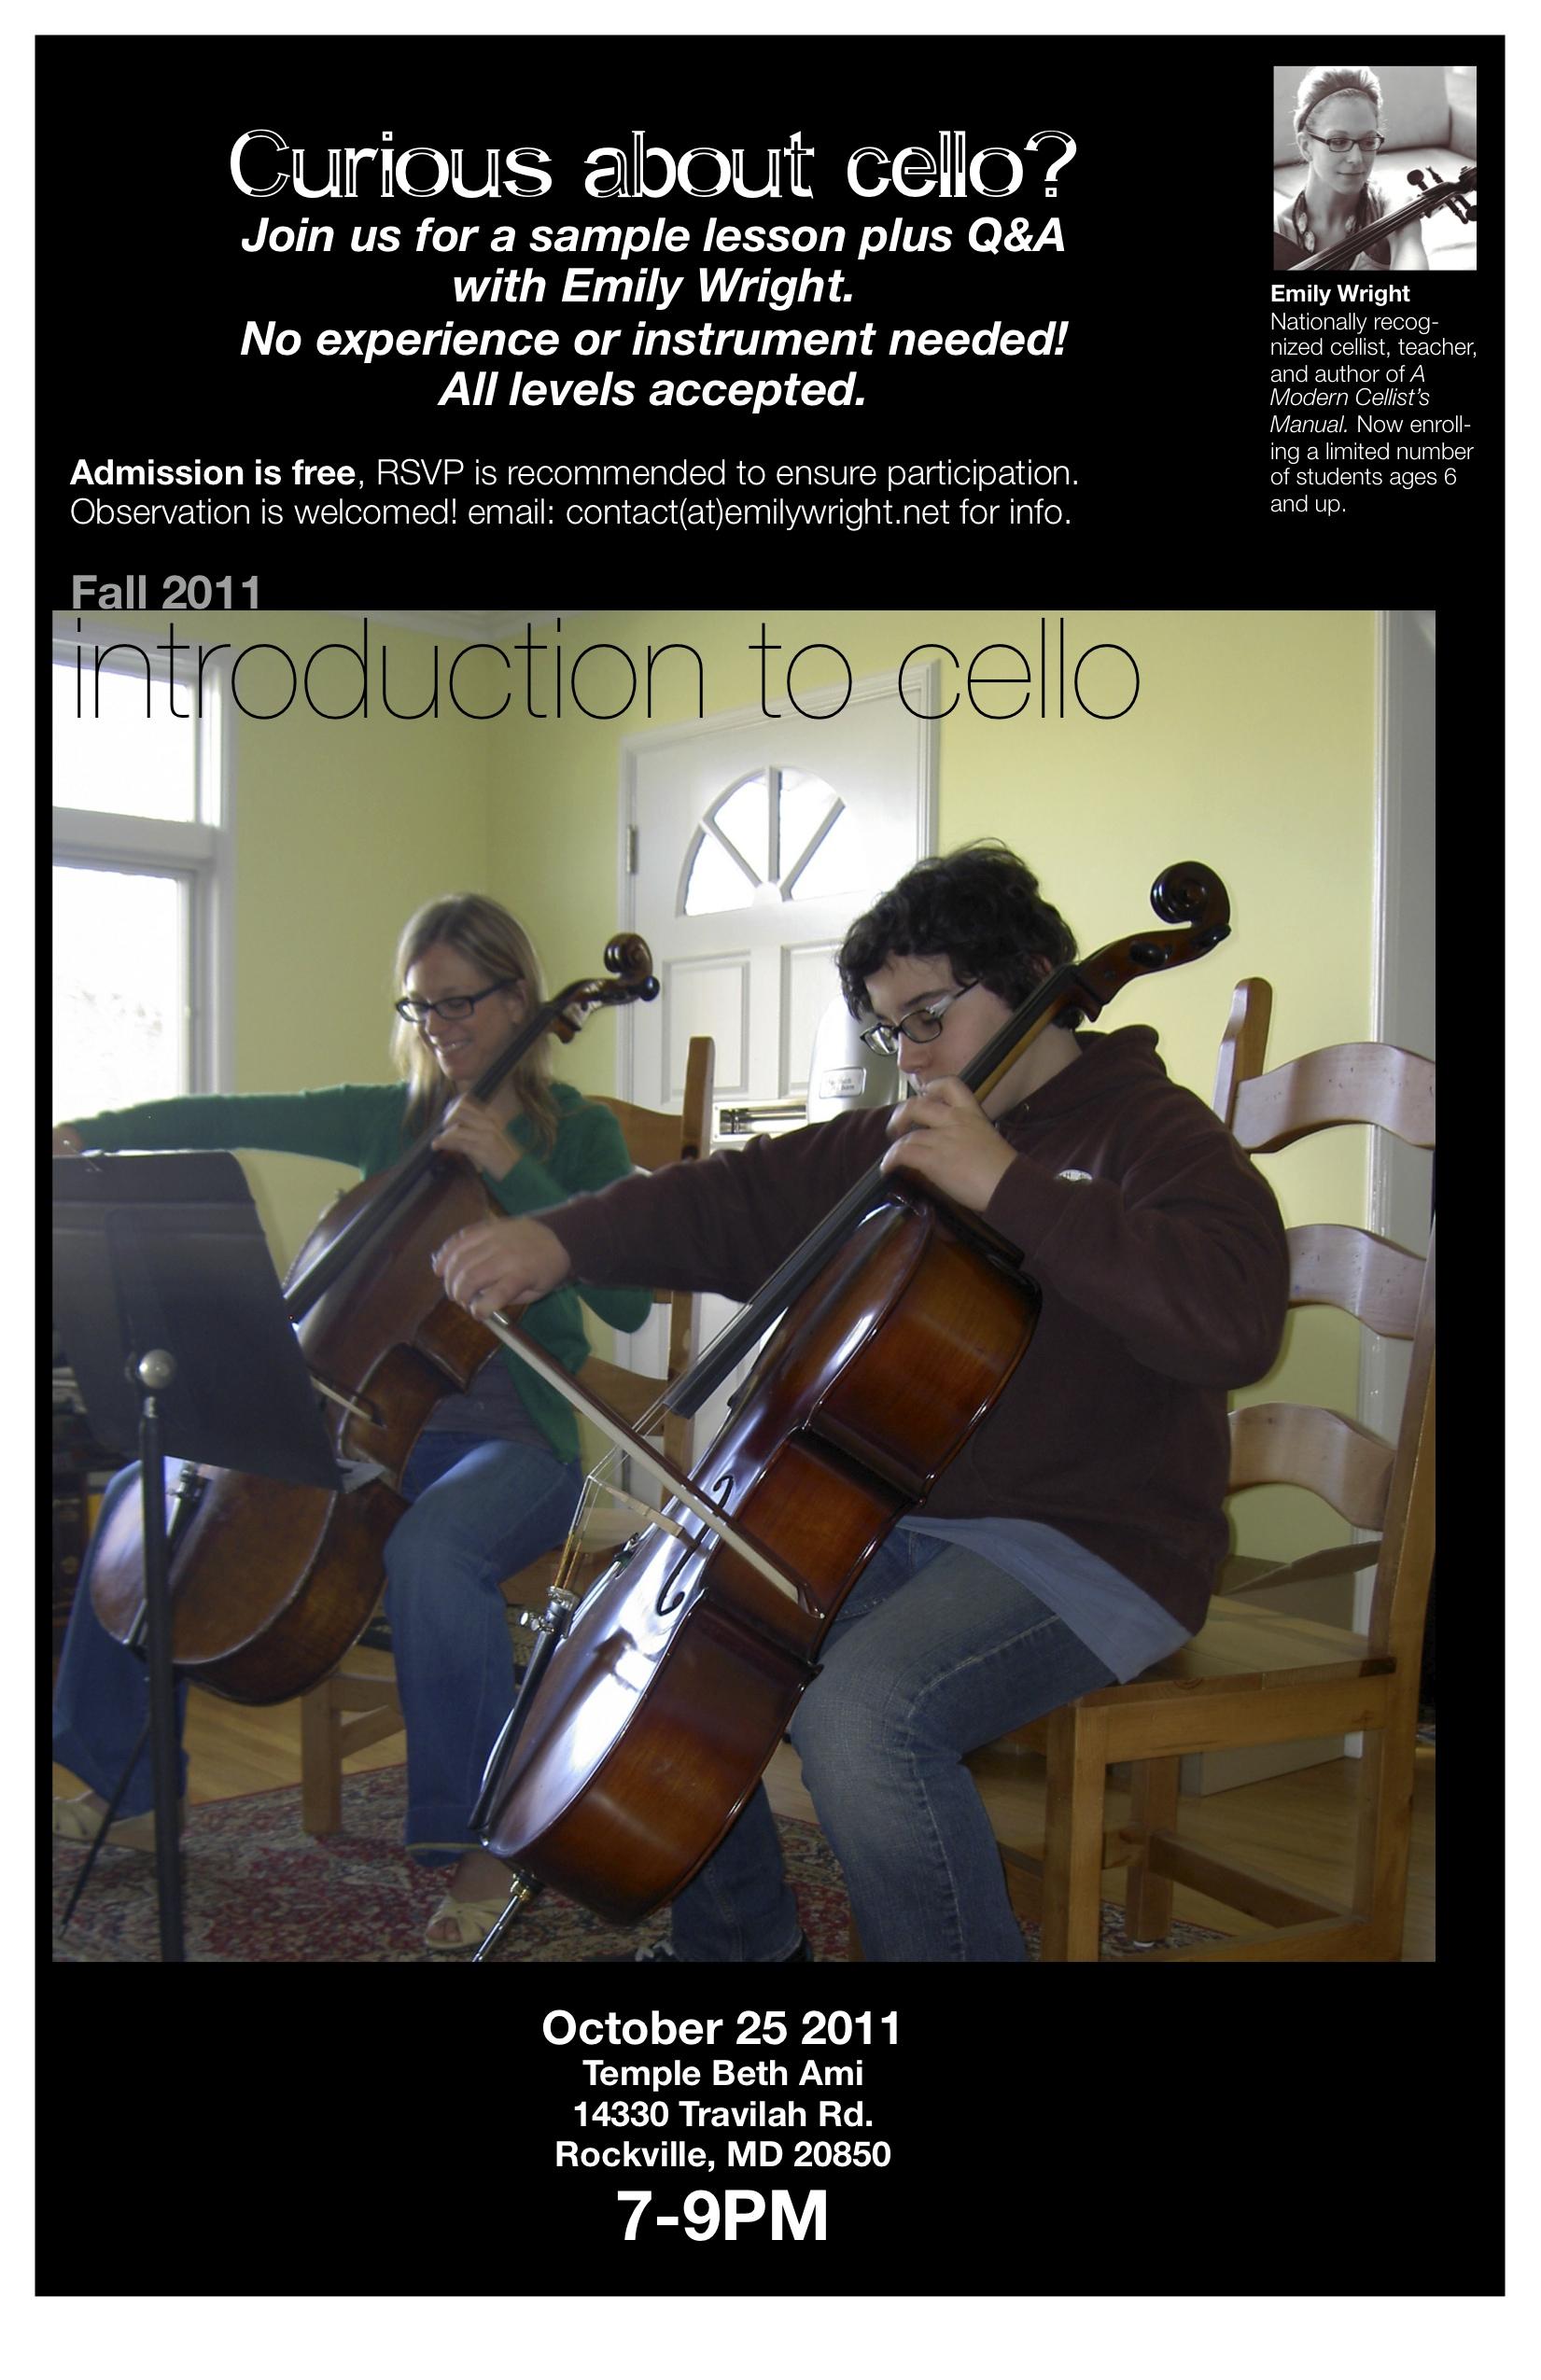 Beltway Cello Event!